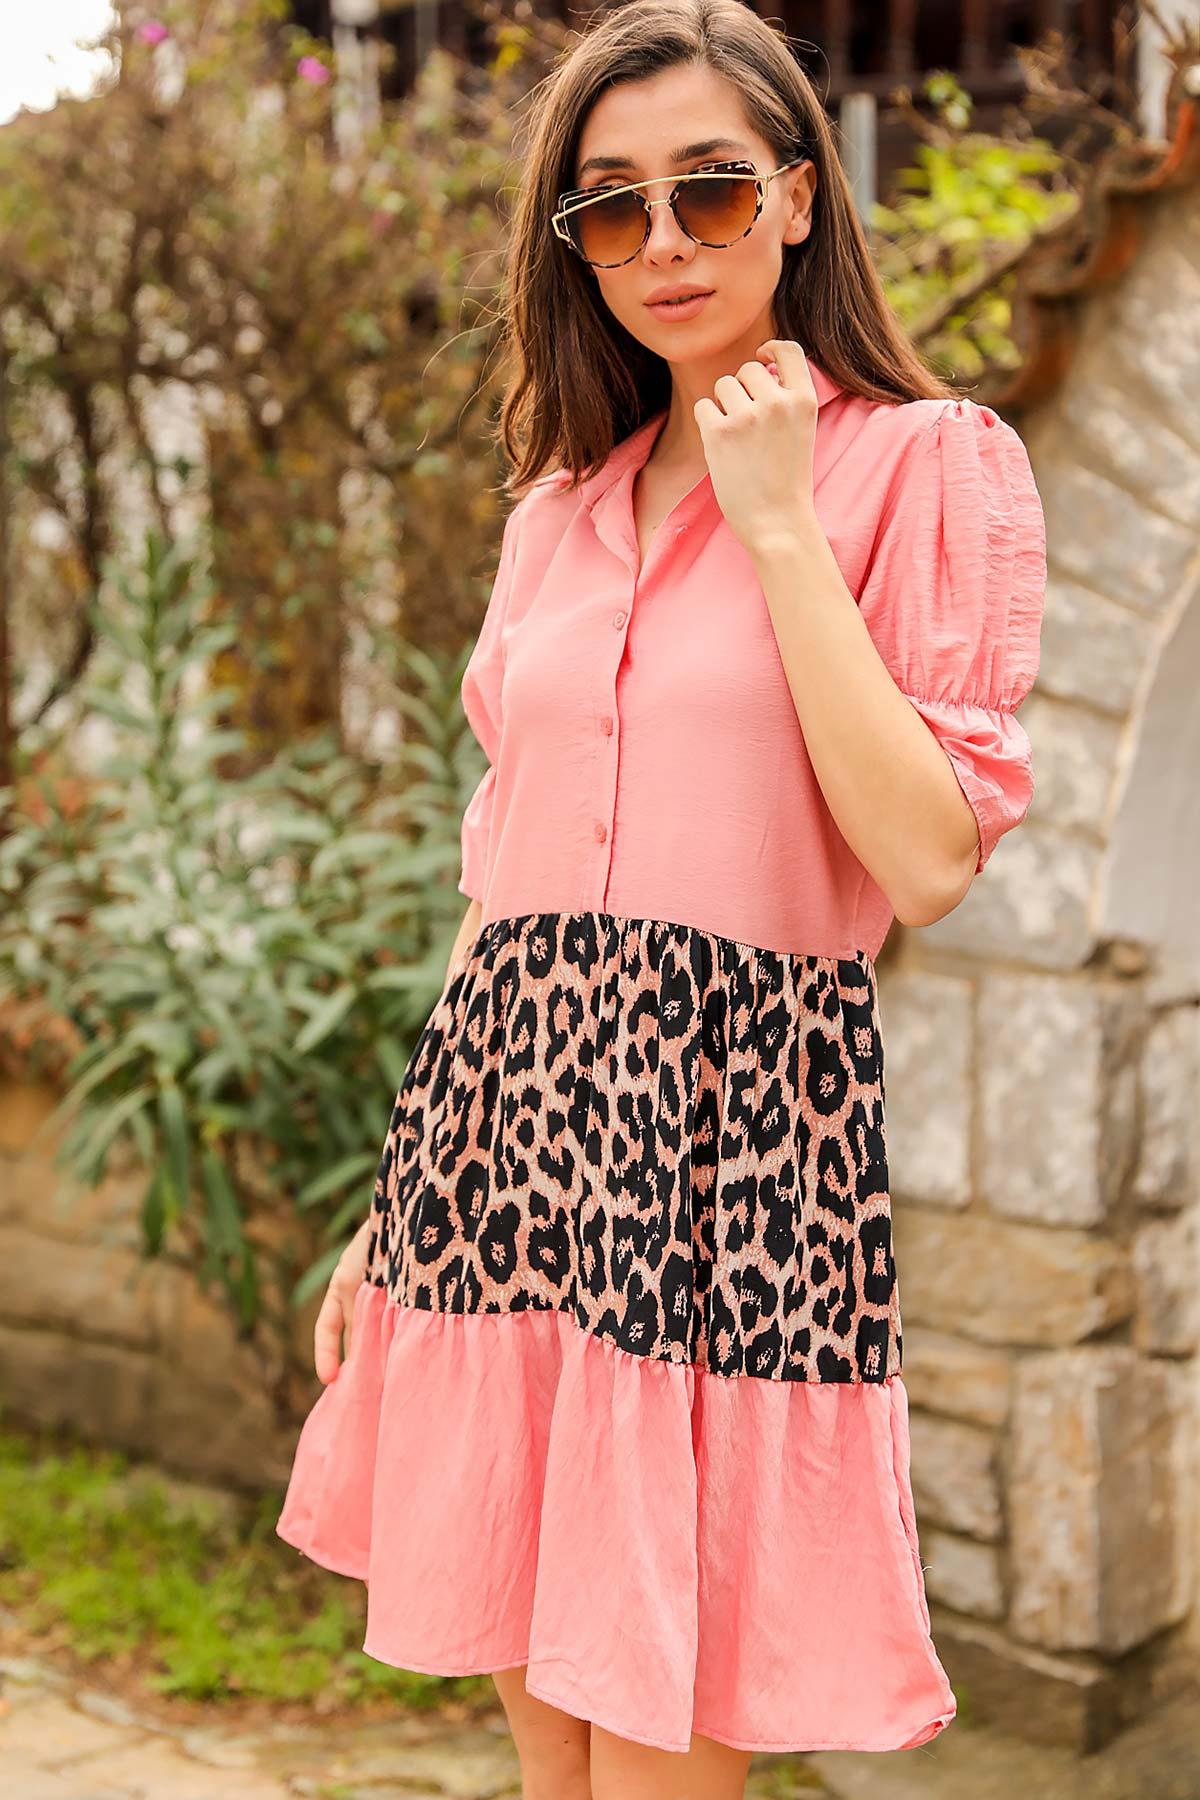 فستان قصير وردي مزخرف ستايل فهد بأكمام بالون نسائي